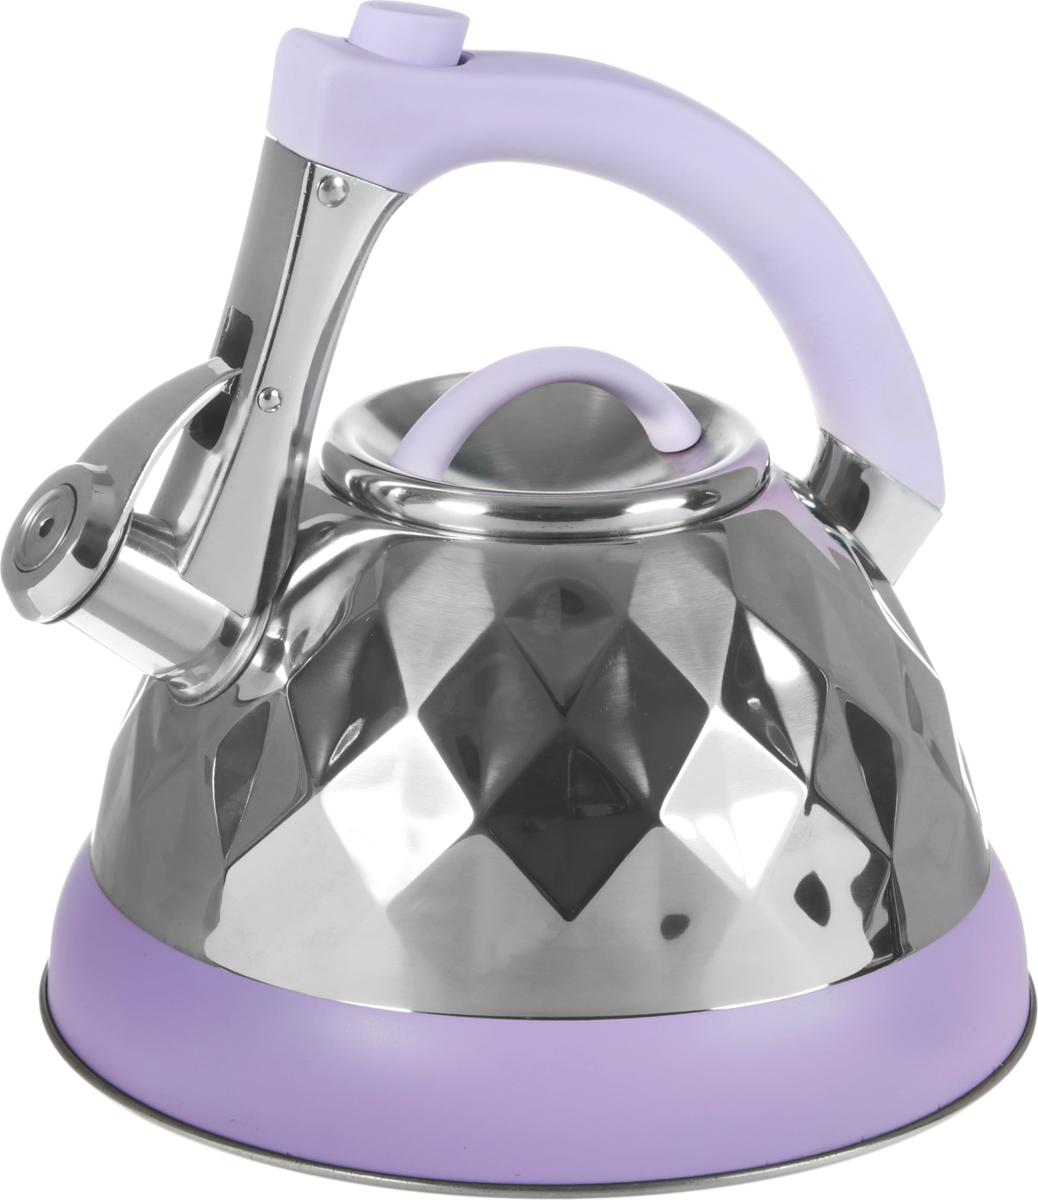 Чайник Bohmann, со свистком, цвет: сиреневый, 3,5 л. BH-8087 чайник bohmann bh 9996 blue